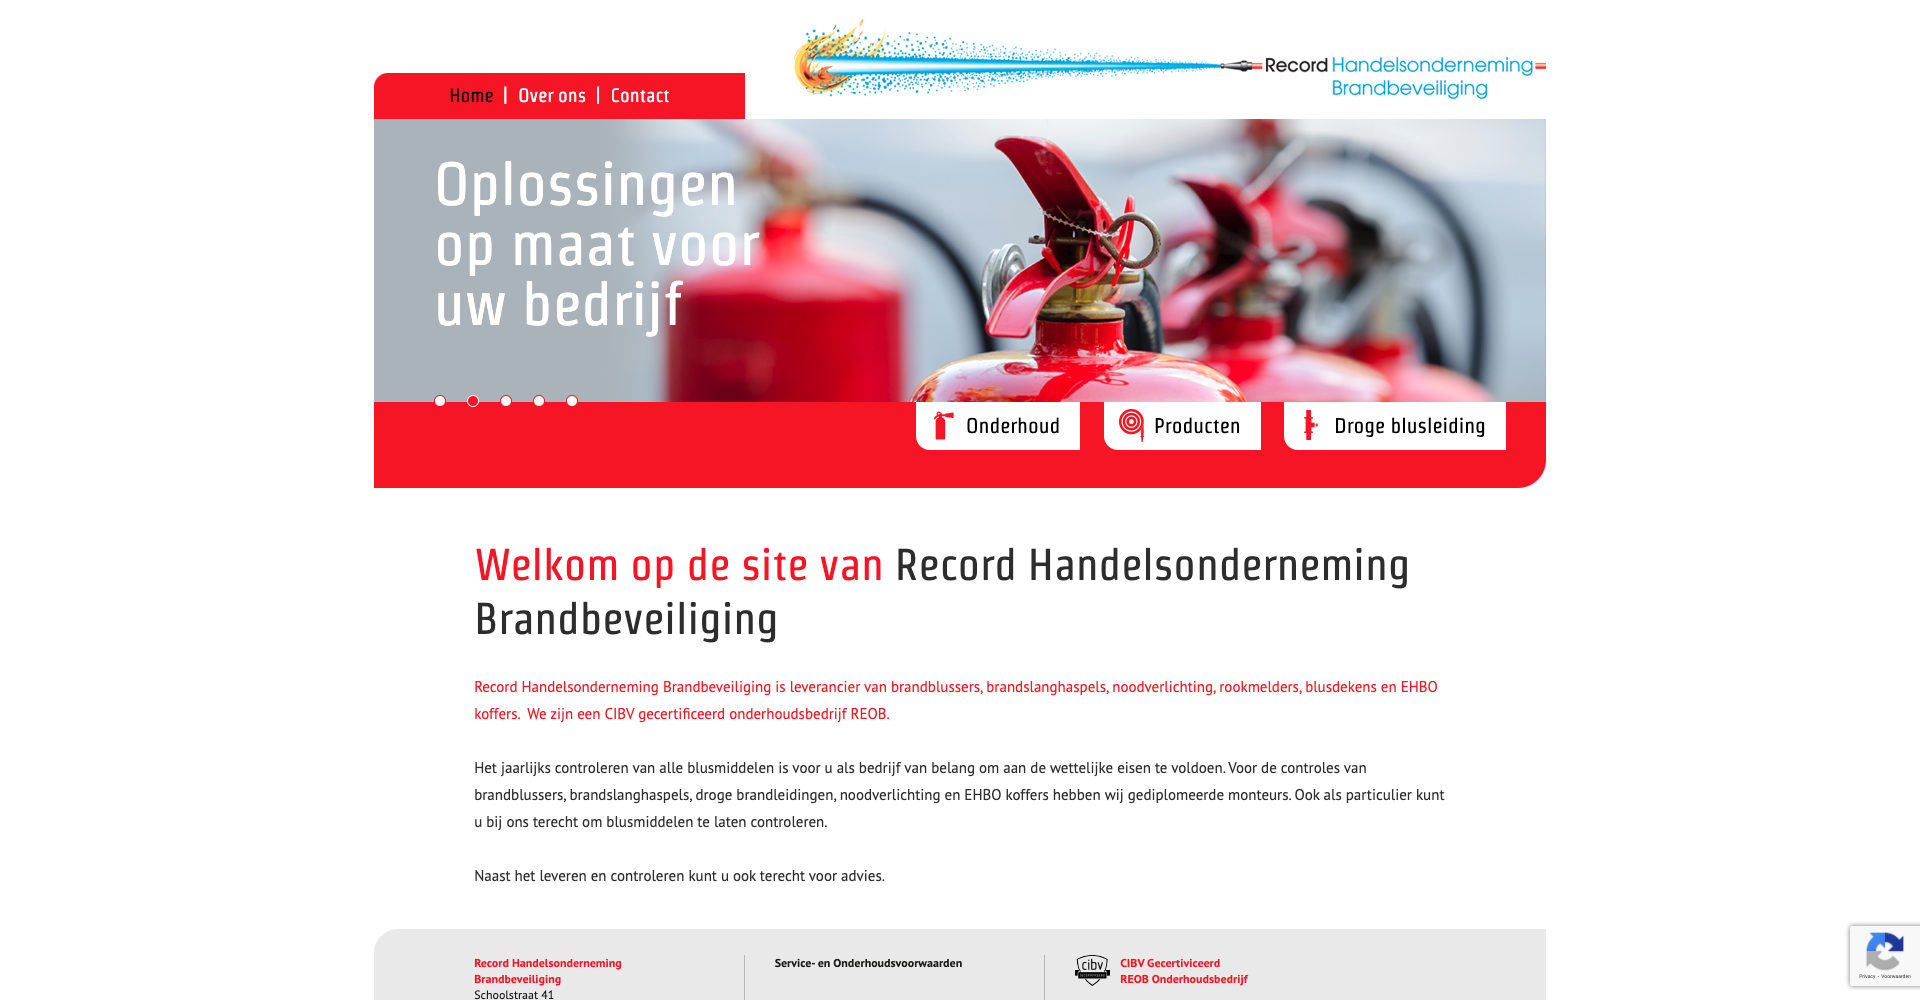 Record Handelsonderneming Brandbeveiliging